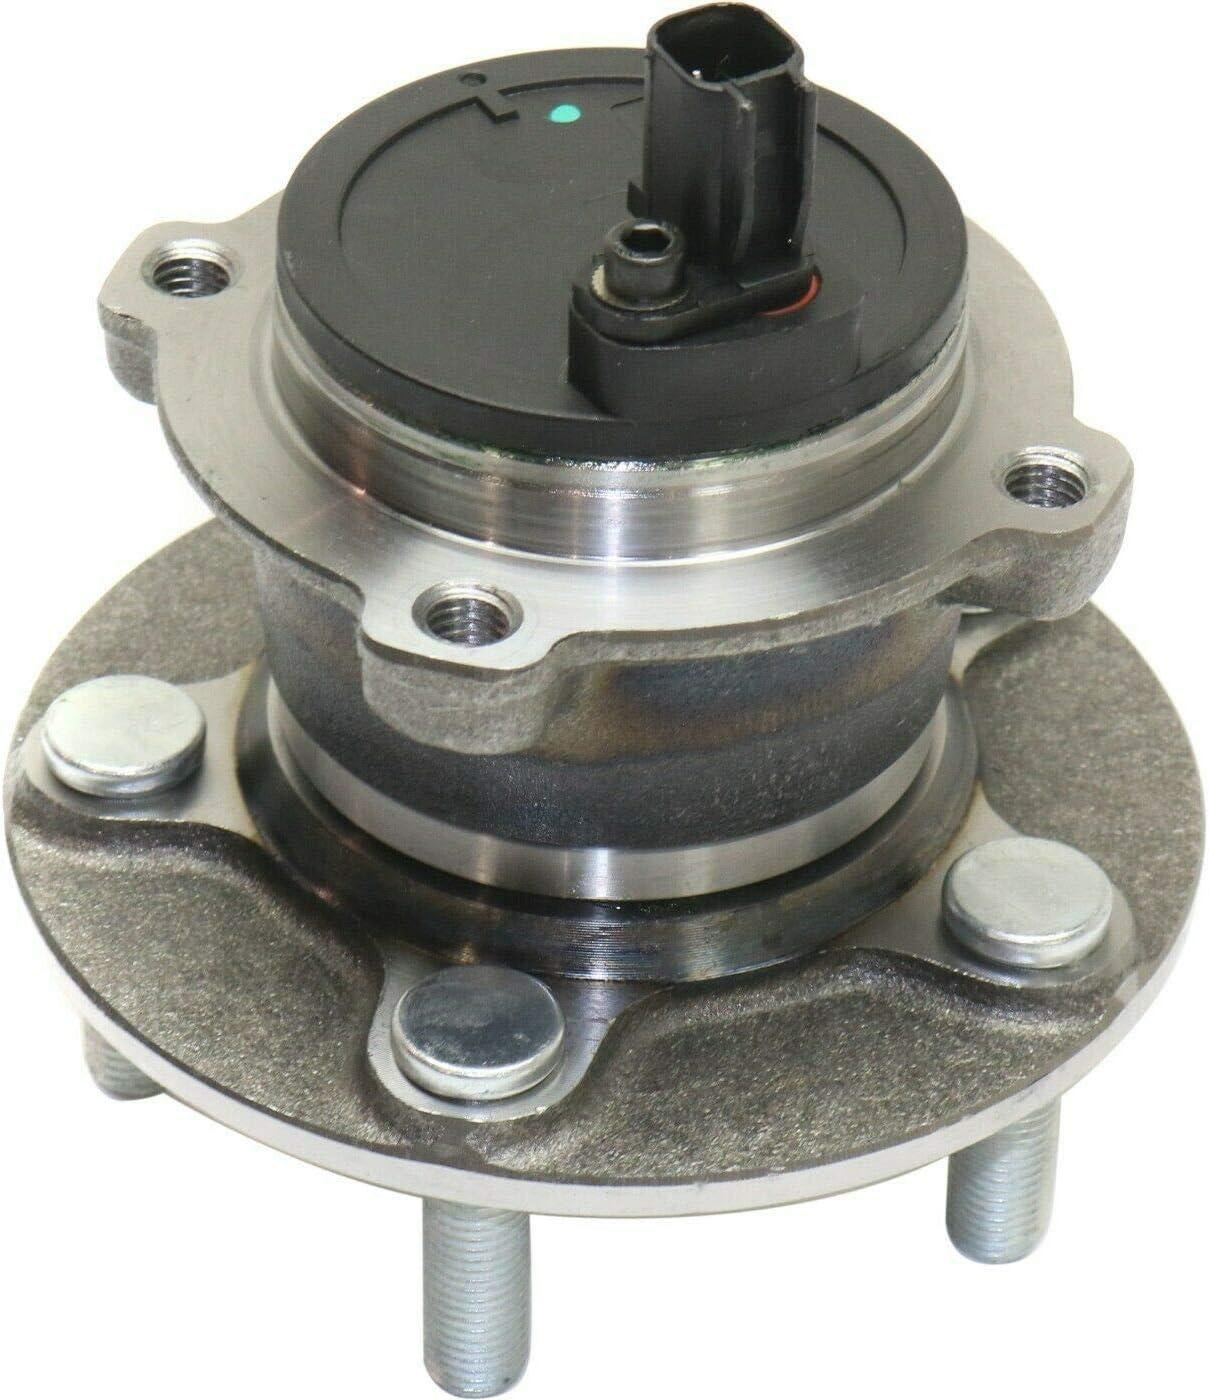 TYBC 1pcs Rear Side Import Wheel Arlington Mall Hub and Bearing wi Compatible Assembly